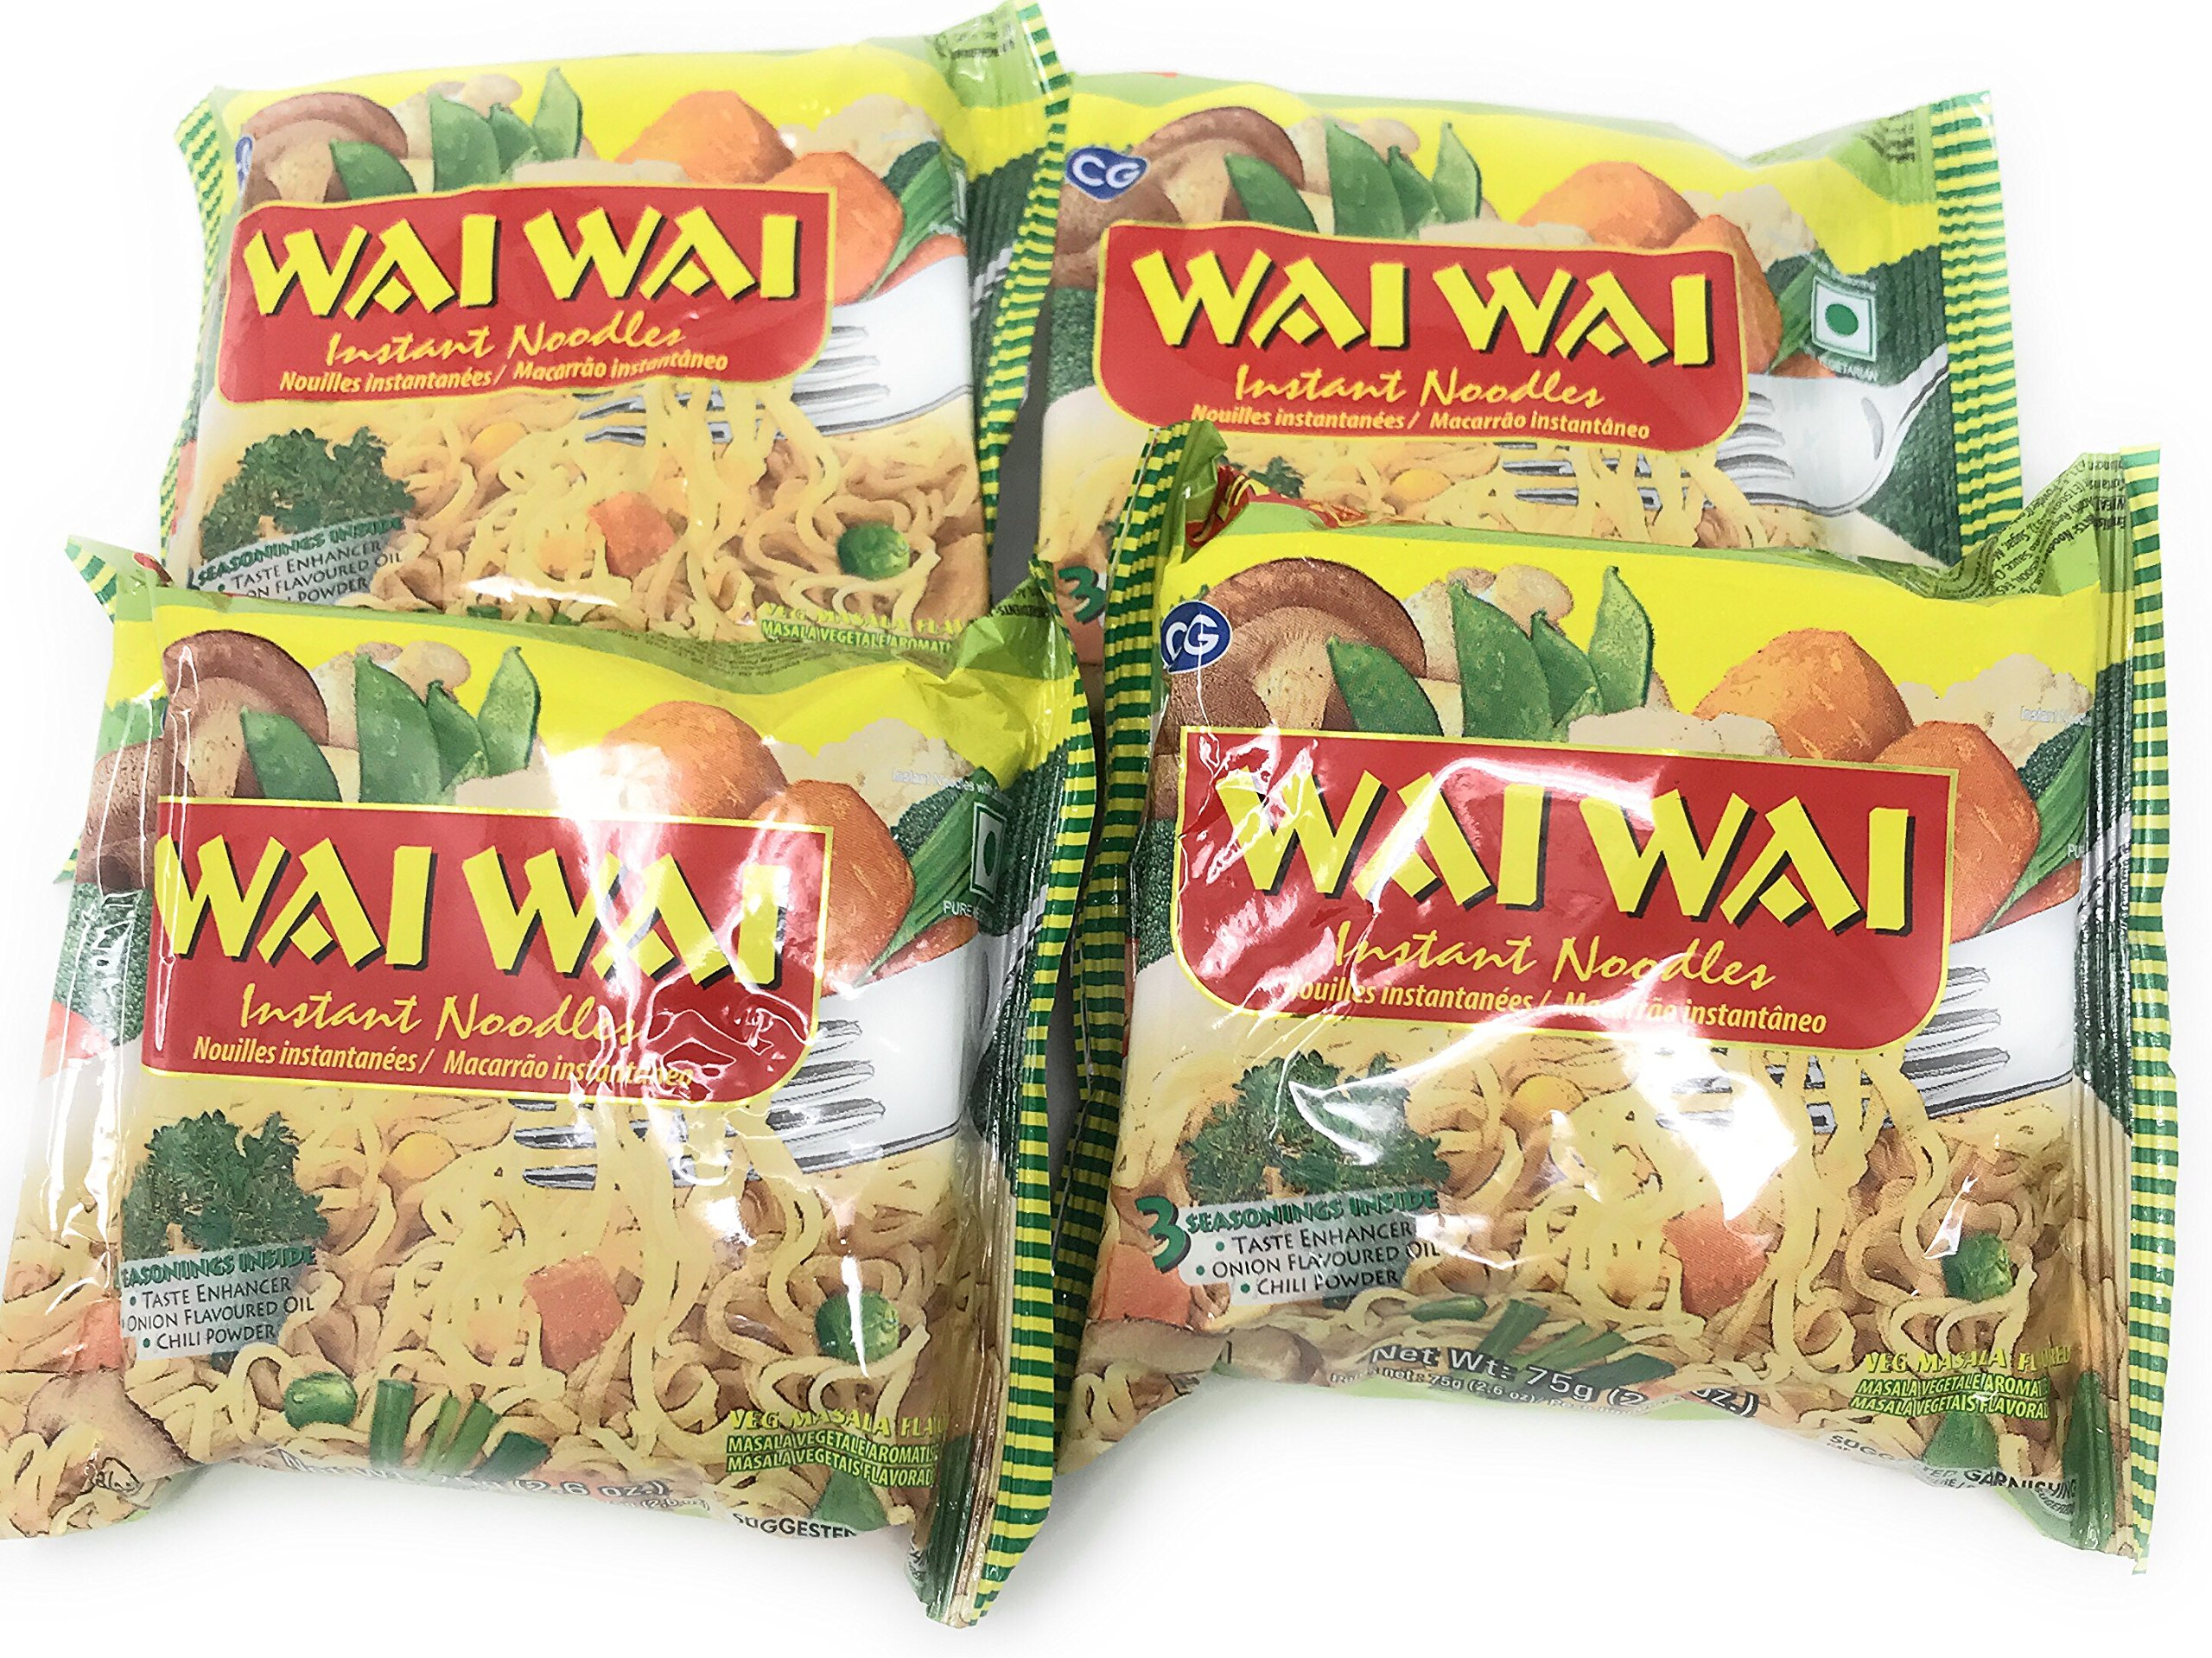 Amazon com : Wai Wai Nepali Instant Noodles by Chaudhary group